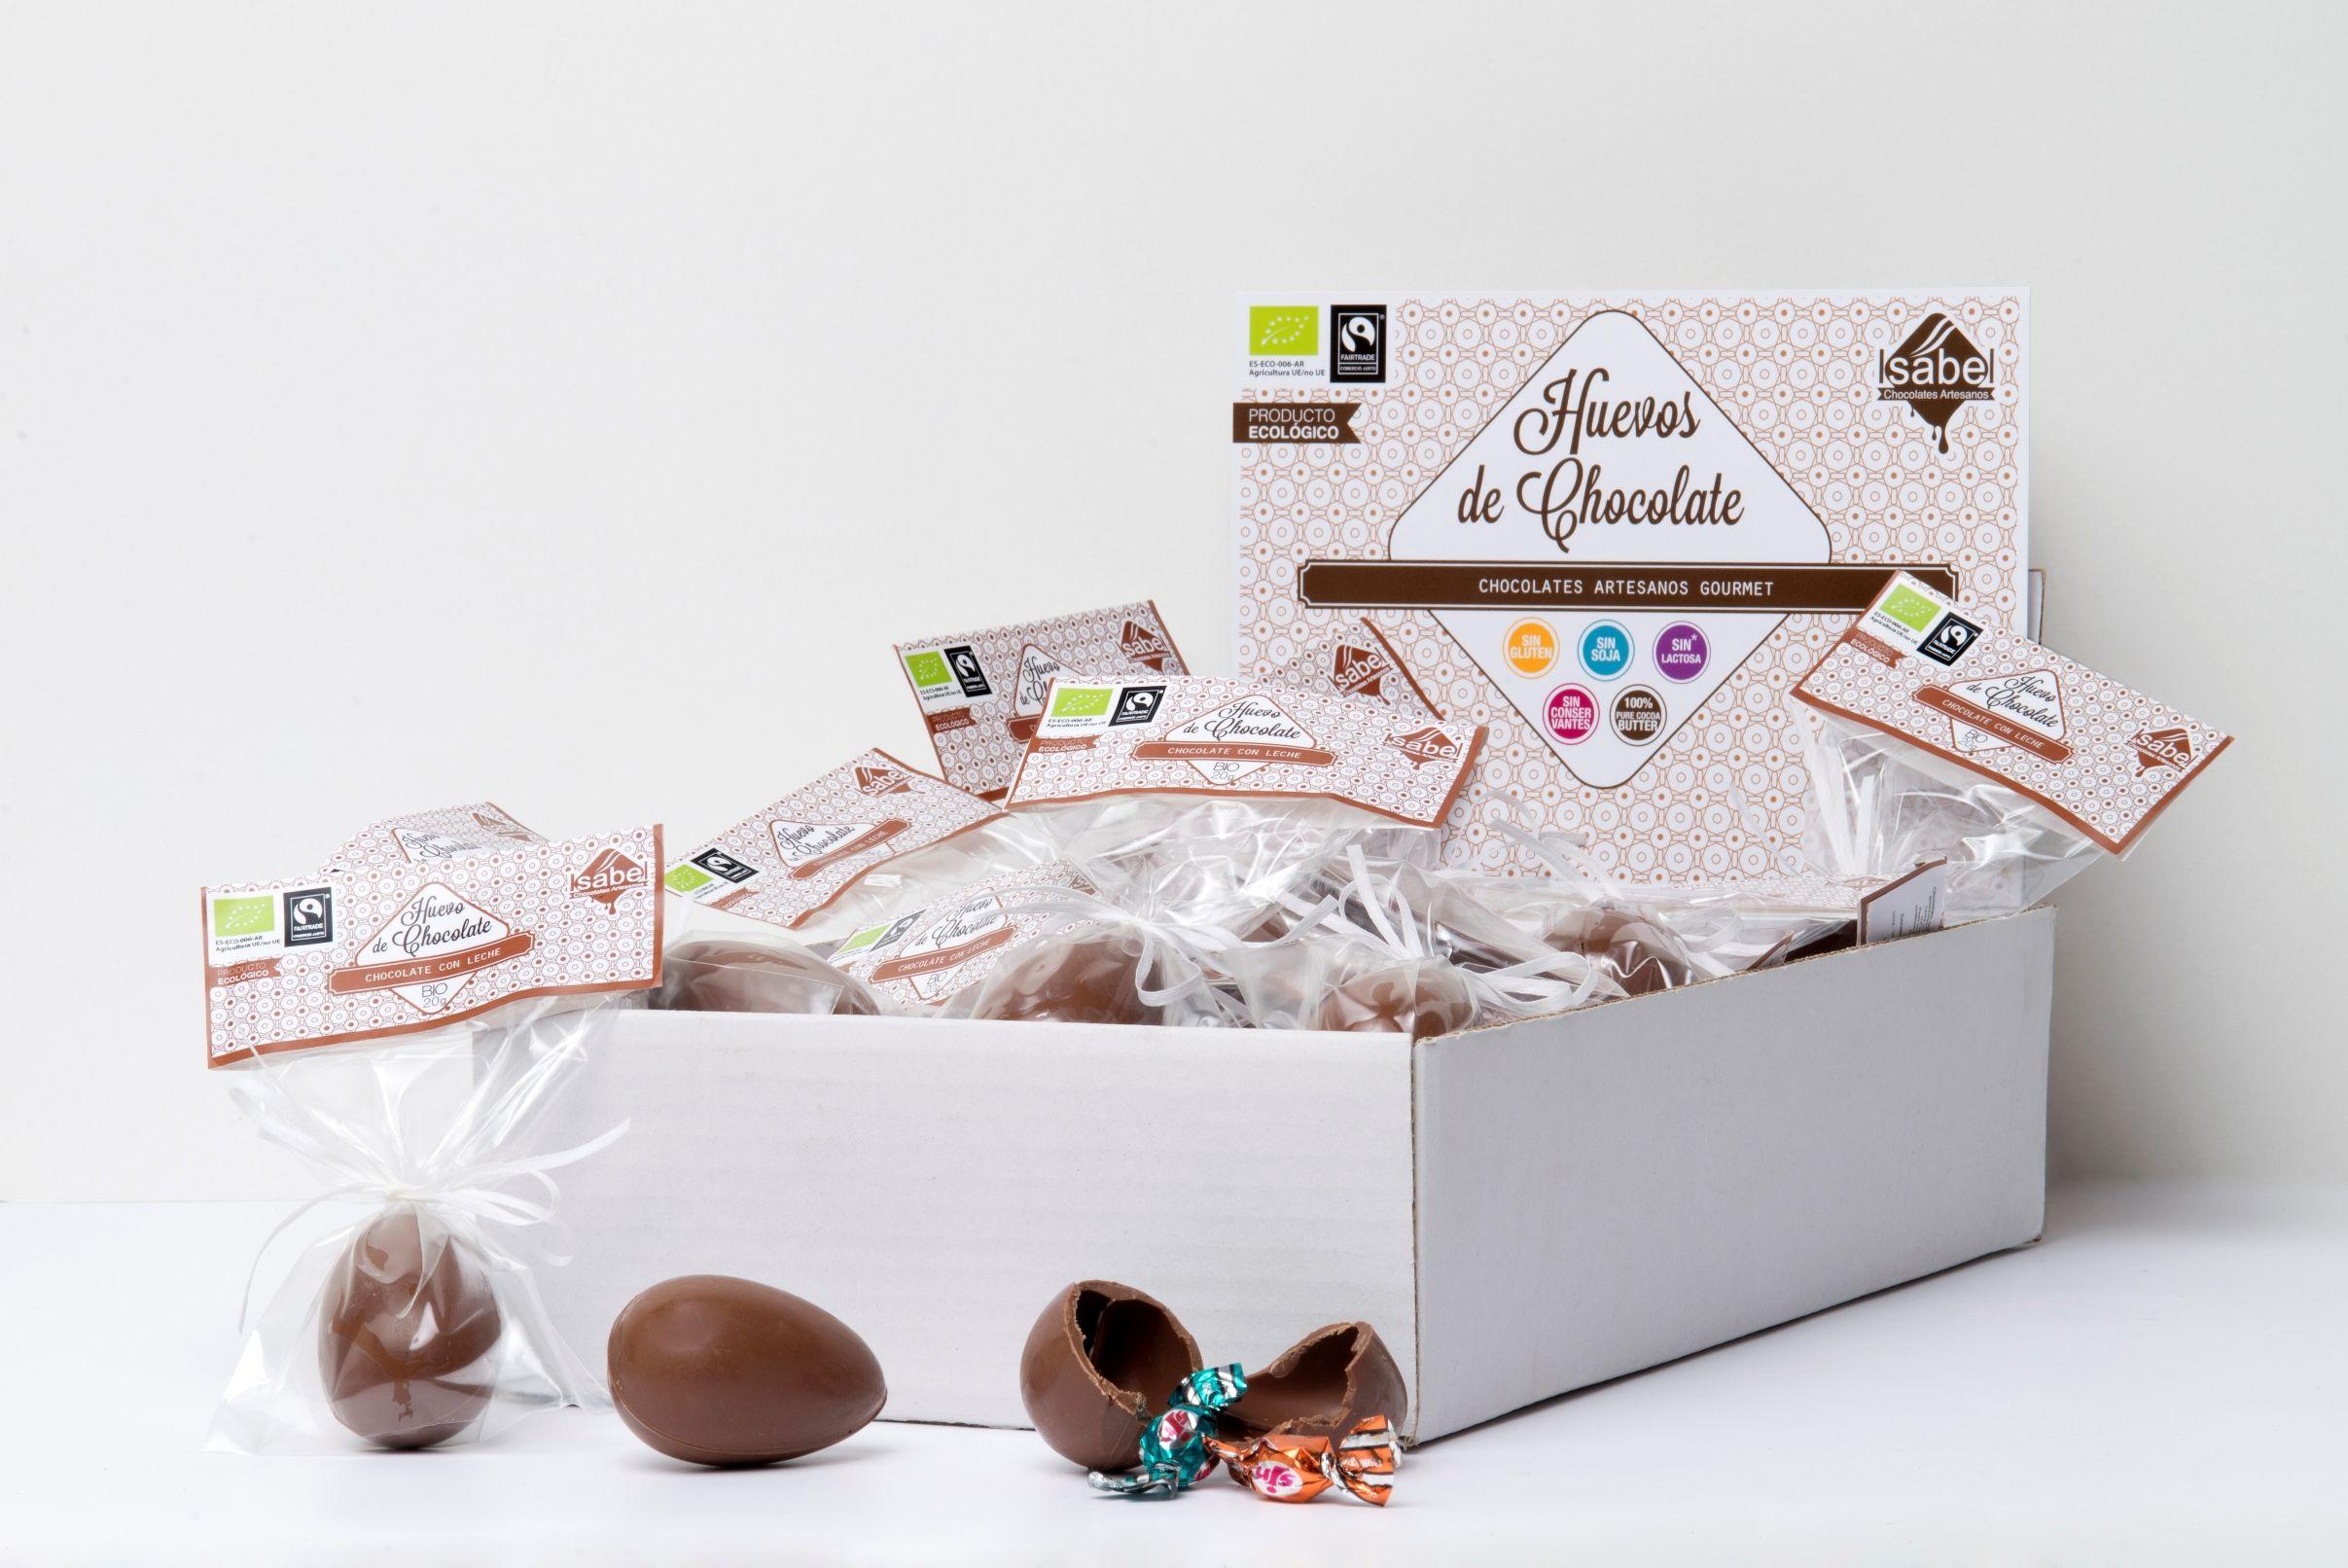 Huevos de Chocolate con leche, de comercio justo.